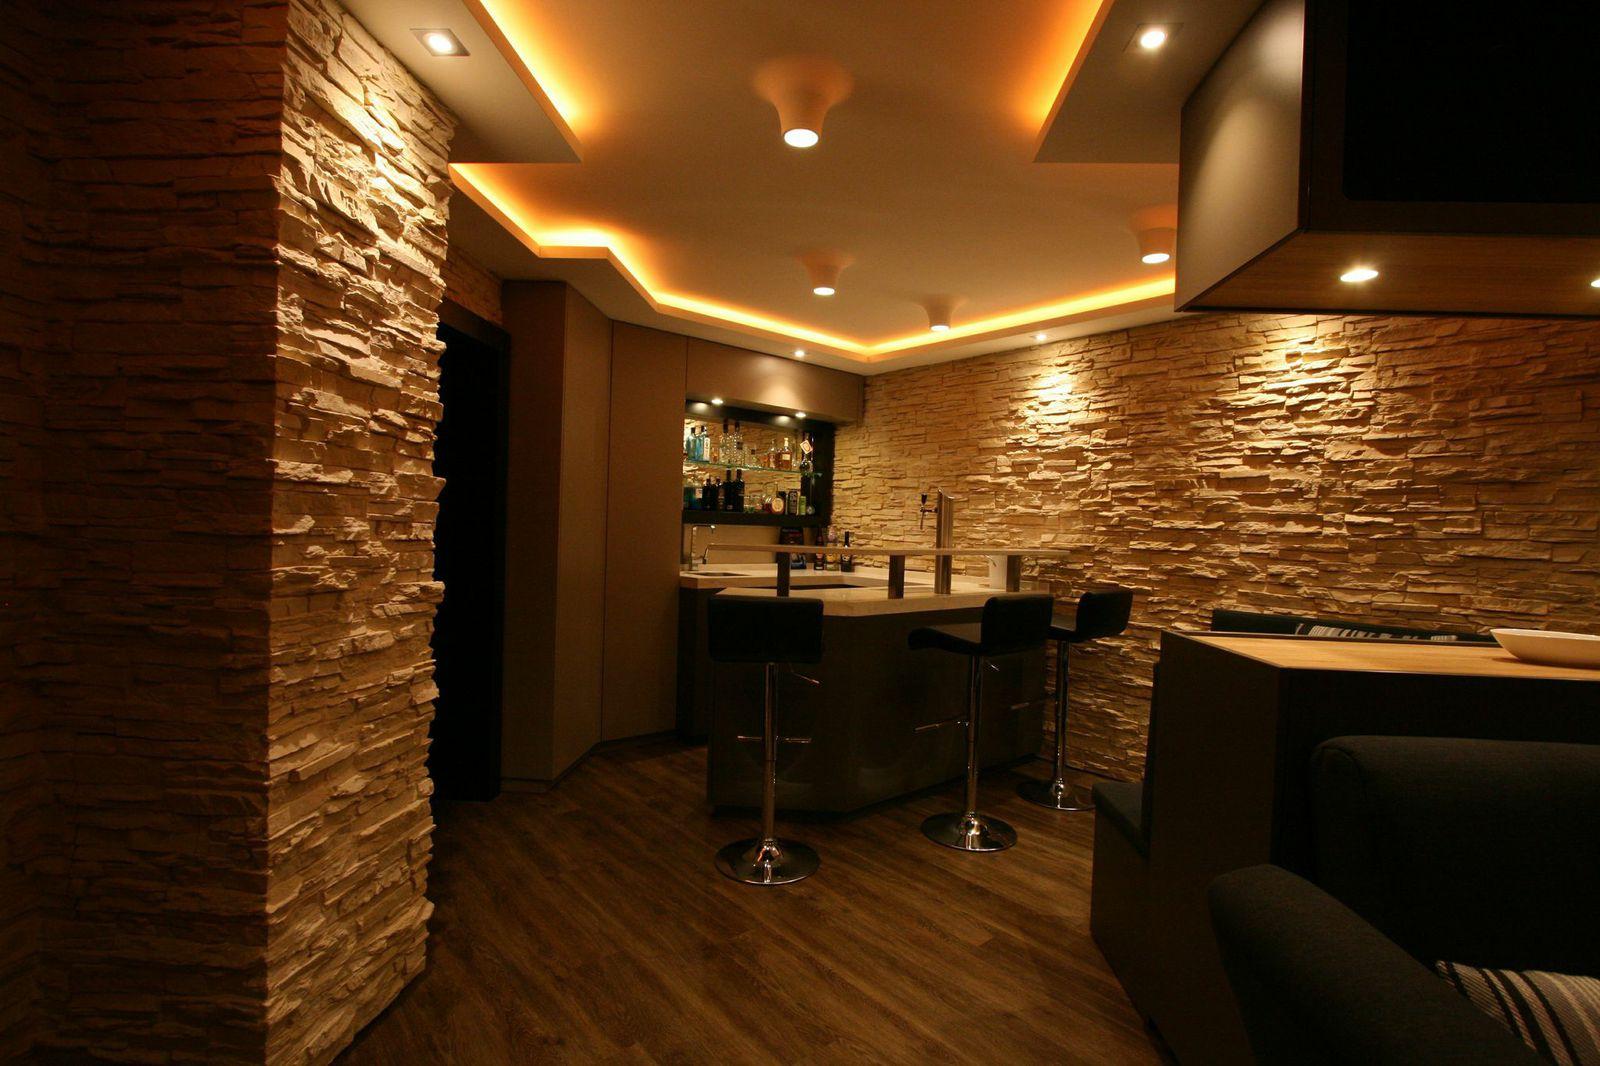 heimkino k4 cine lounge bar heimkinoraum hamburg. Black Bedroom Furniture Sets. Home Design Ideas